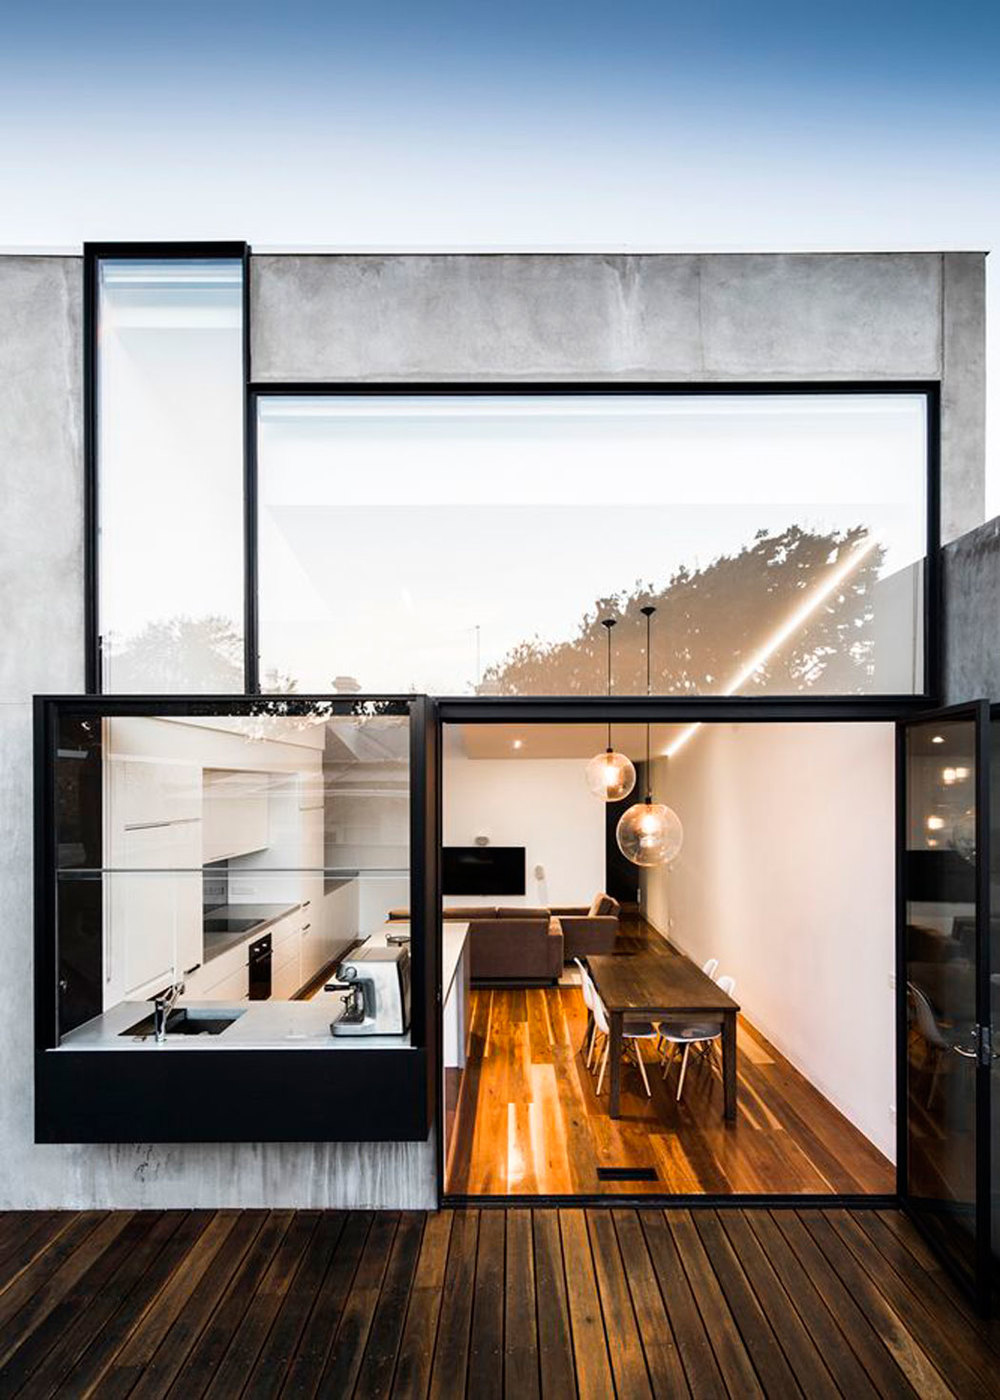 HERO-Glass-Concrete-Modern-home-Architecture-ITCHBAN.com